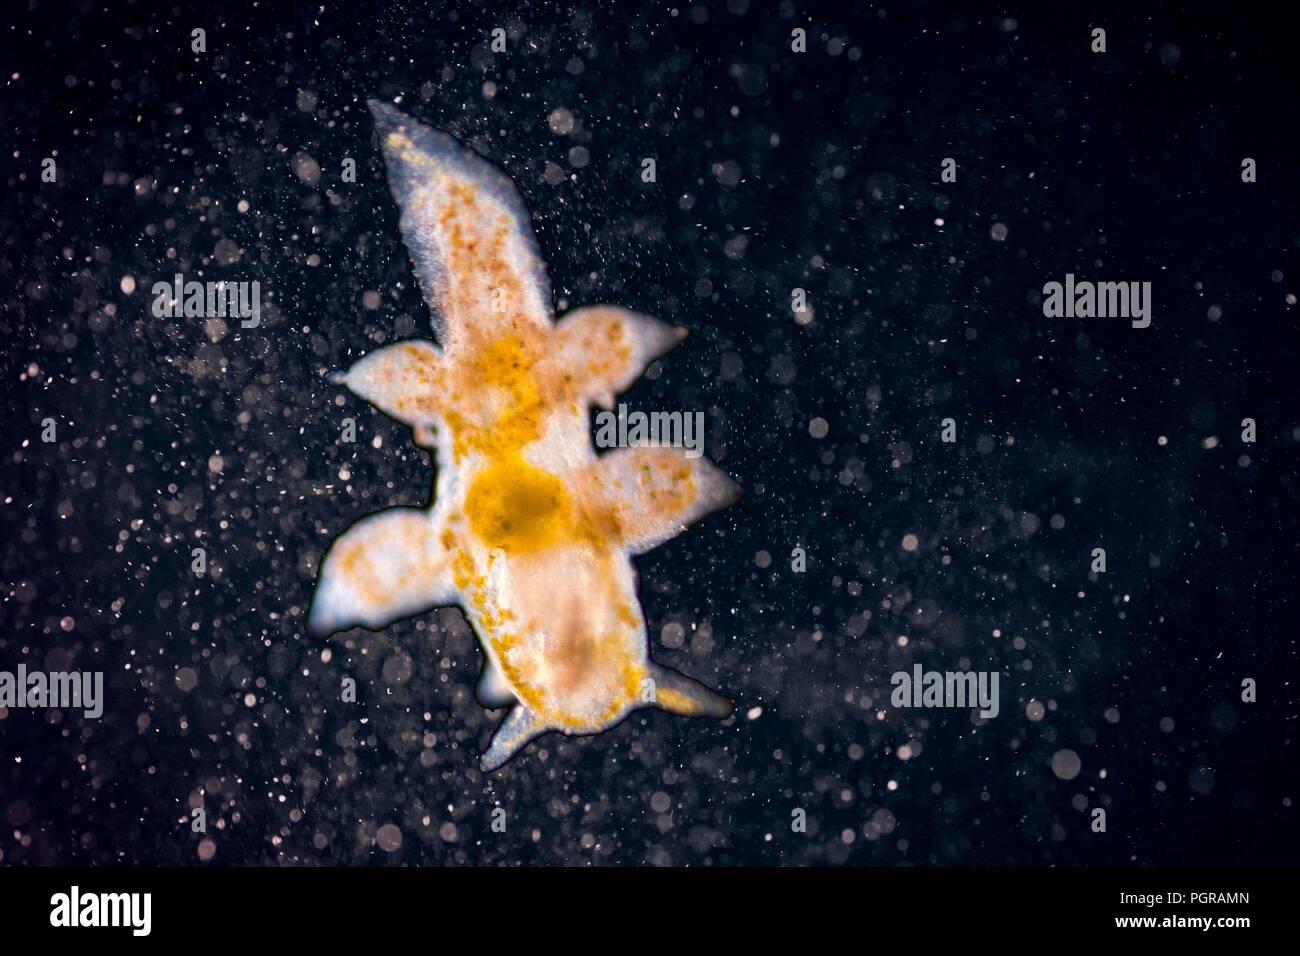 Microscopic Nudibranch marine gastropod mollusk on magical galaxy background - Stock Image